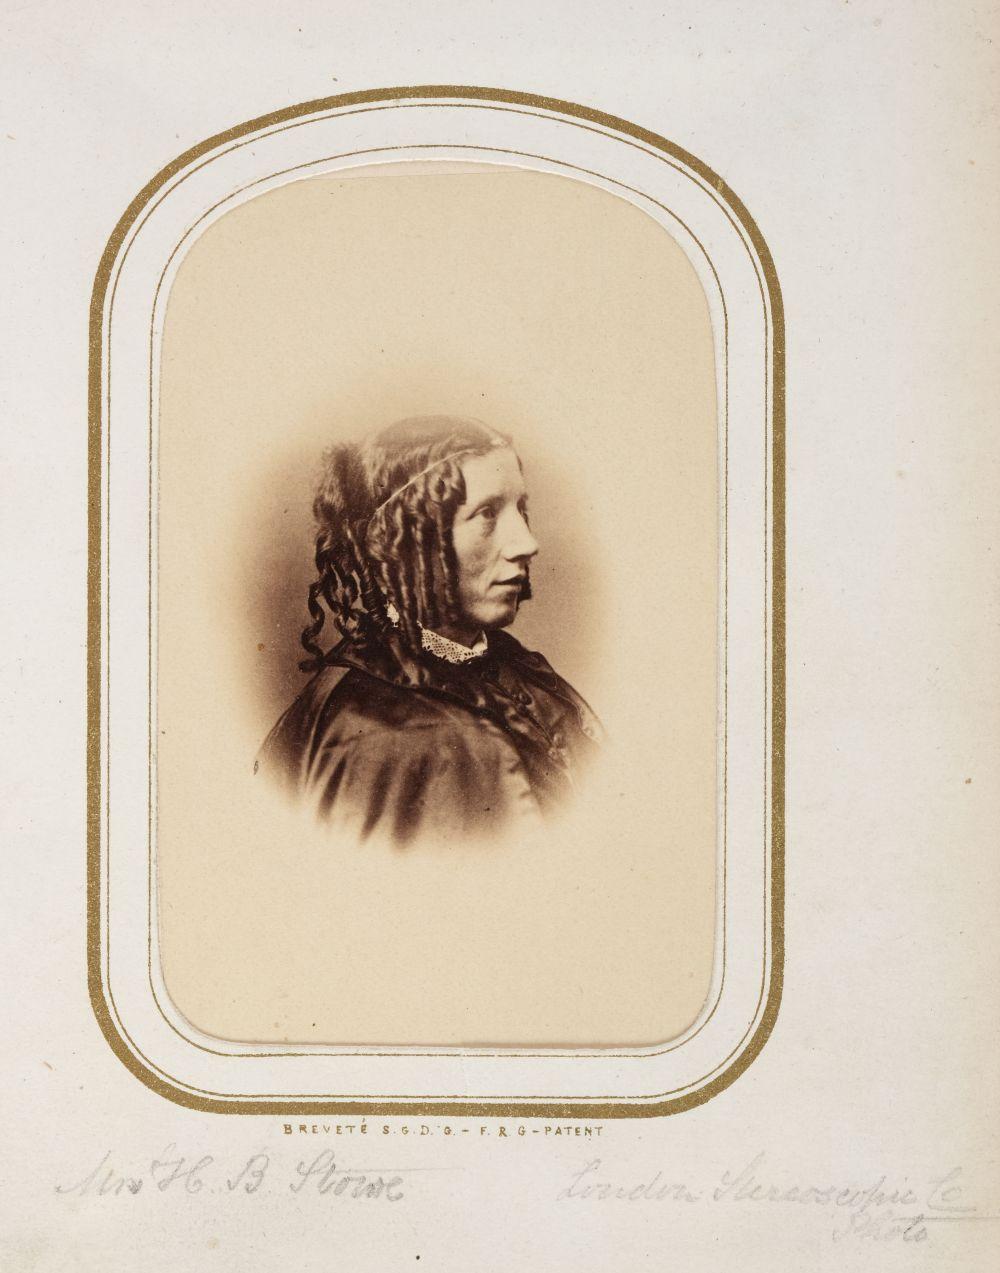 * Cartes de visite. A cartes-de-visite album, c. 1860s/1880s - Image 12 of 18